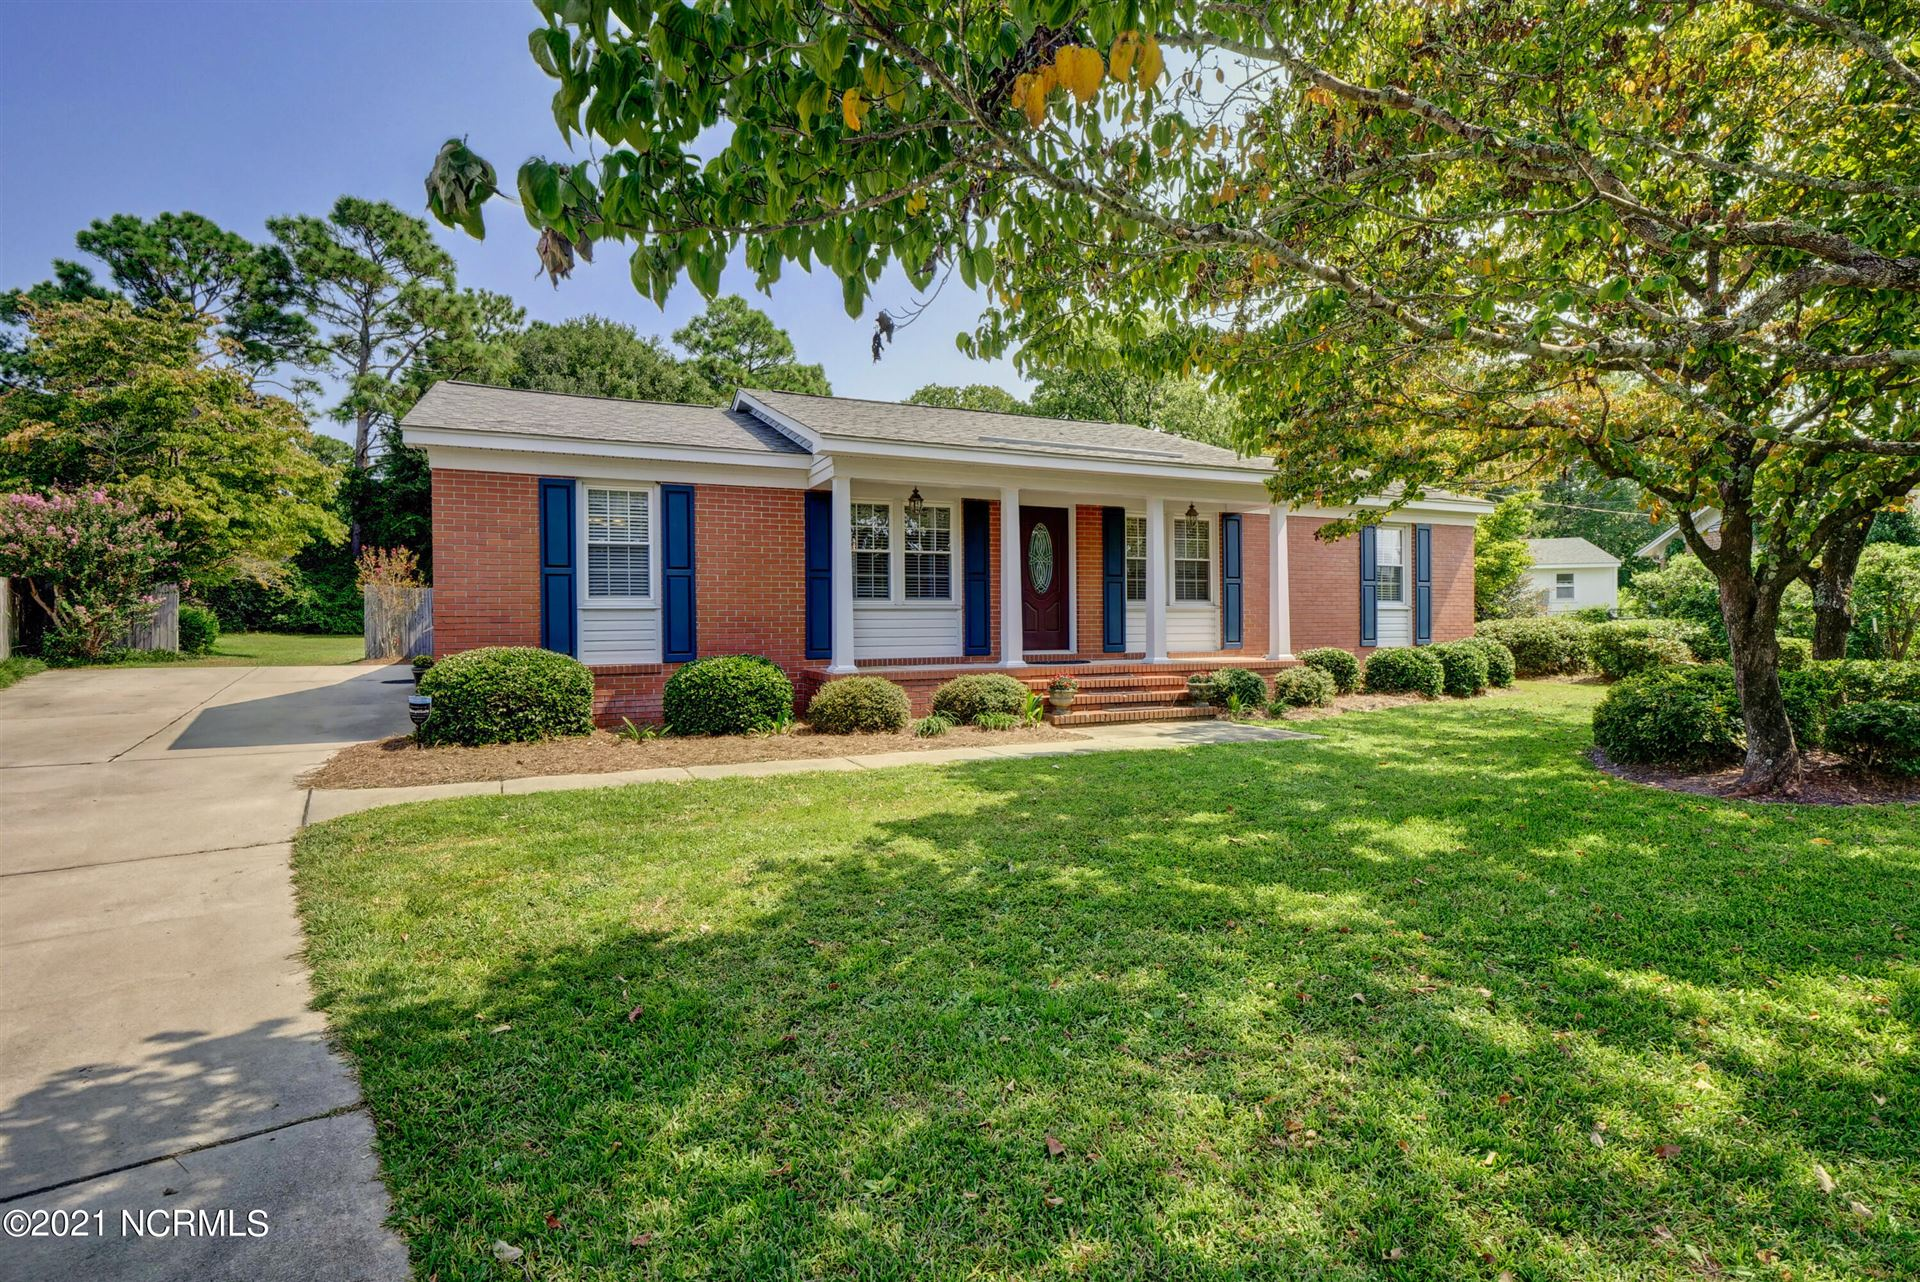 Photo of 205 Wrenwood Circle, Wilmington, NC 28405 (MLS # 100290647)